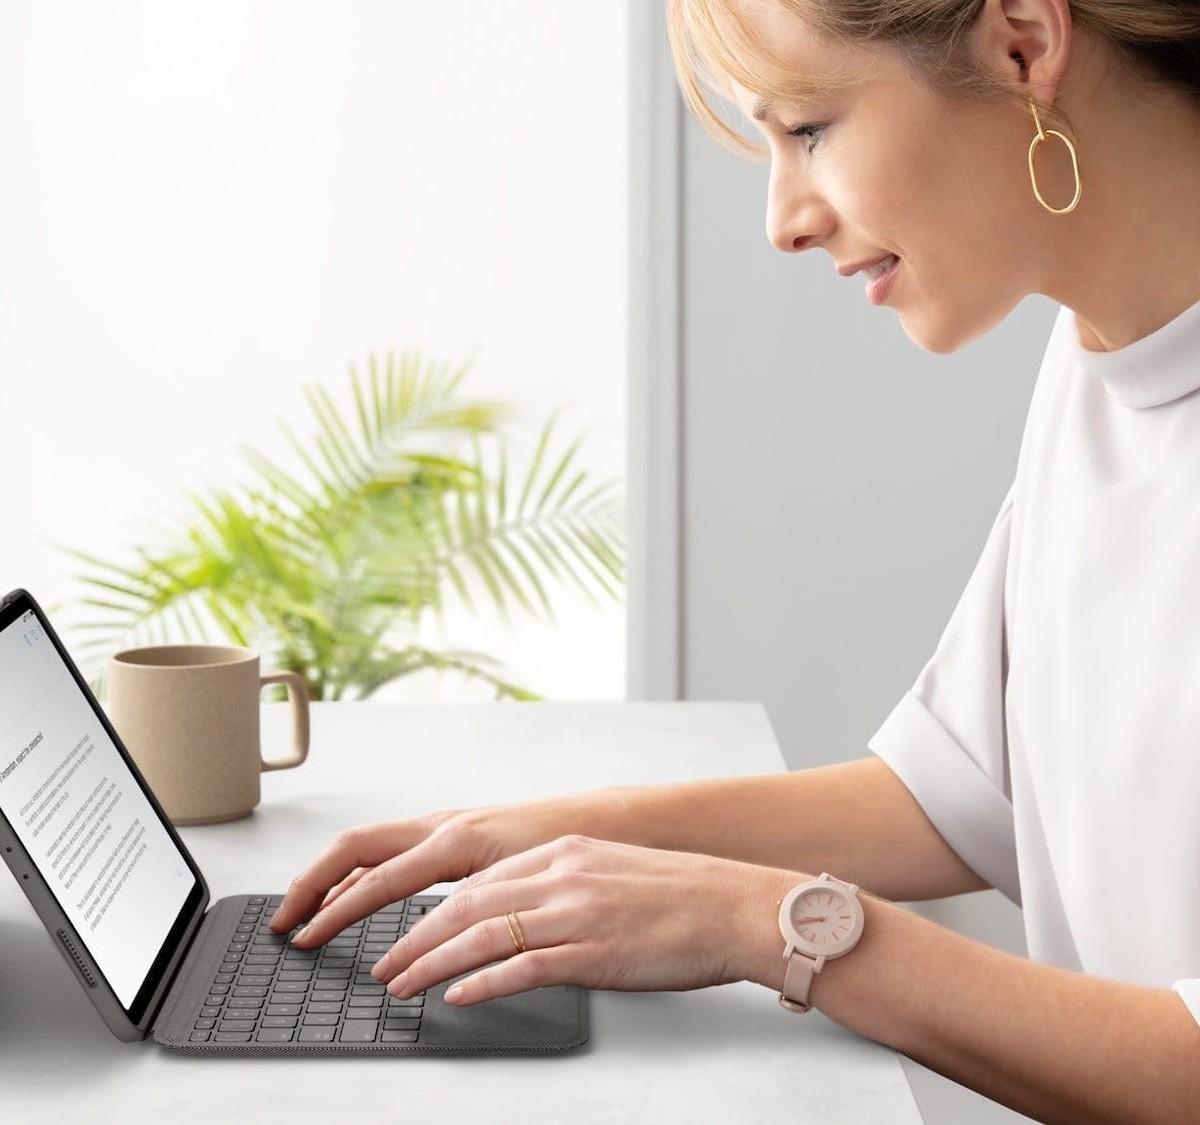 Logitech Folio Touch iPad keyboard case has backlit keys and a trackpad